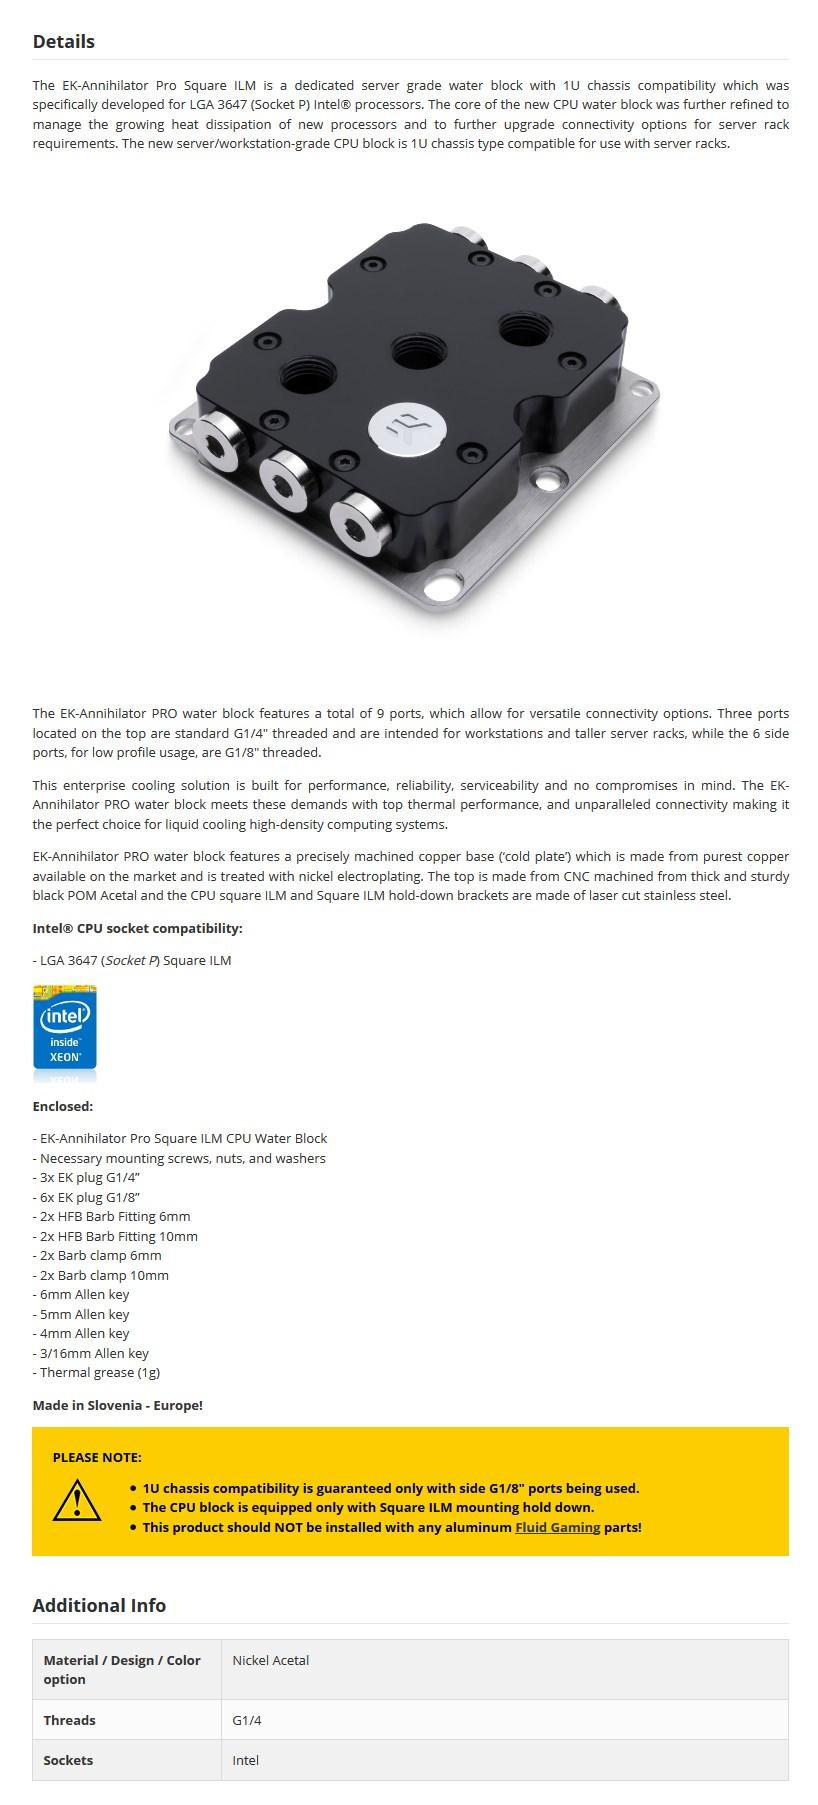 EKWB EK-Annihilator Pro CPU WaterBlock for Intel Sockets - Square ILM - Desktop Overview 1